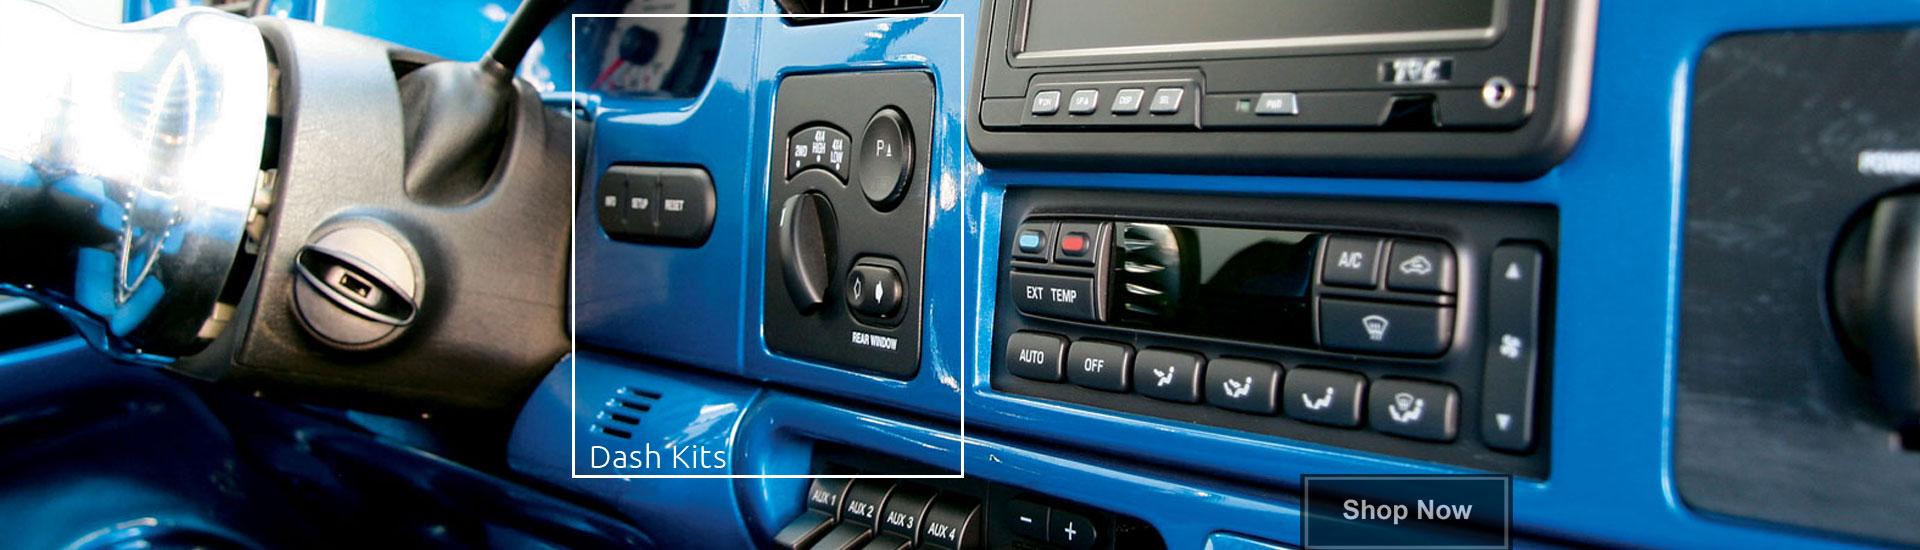 Auto Dash Kits